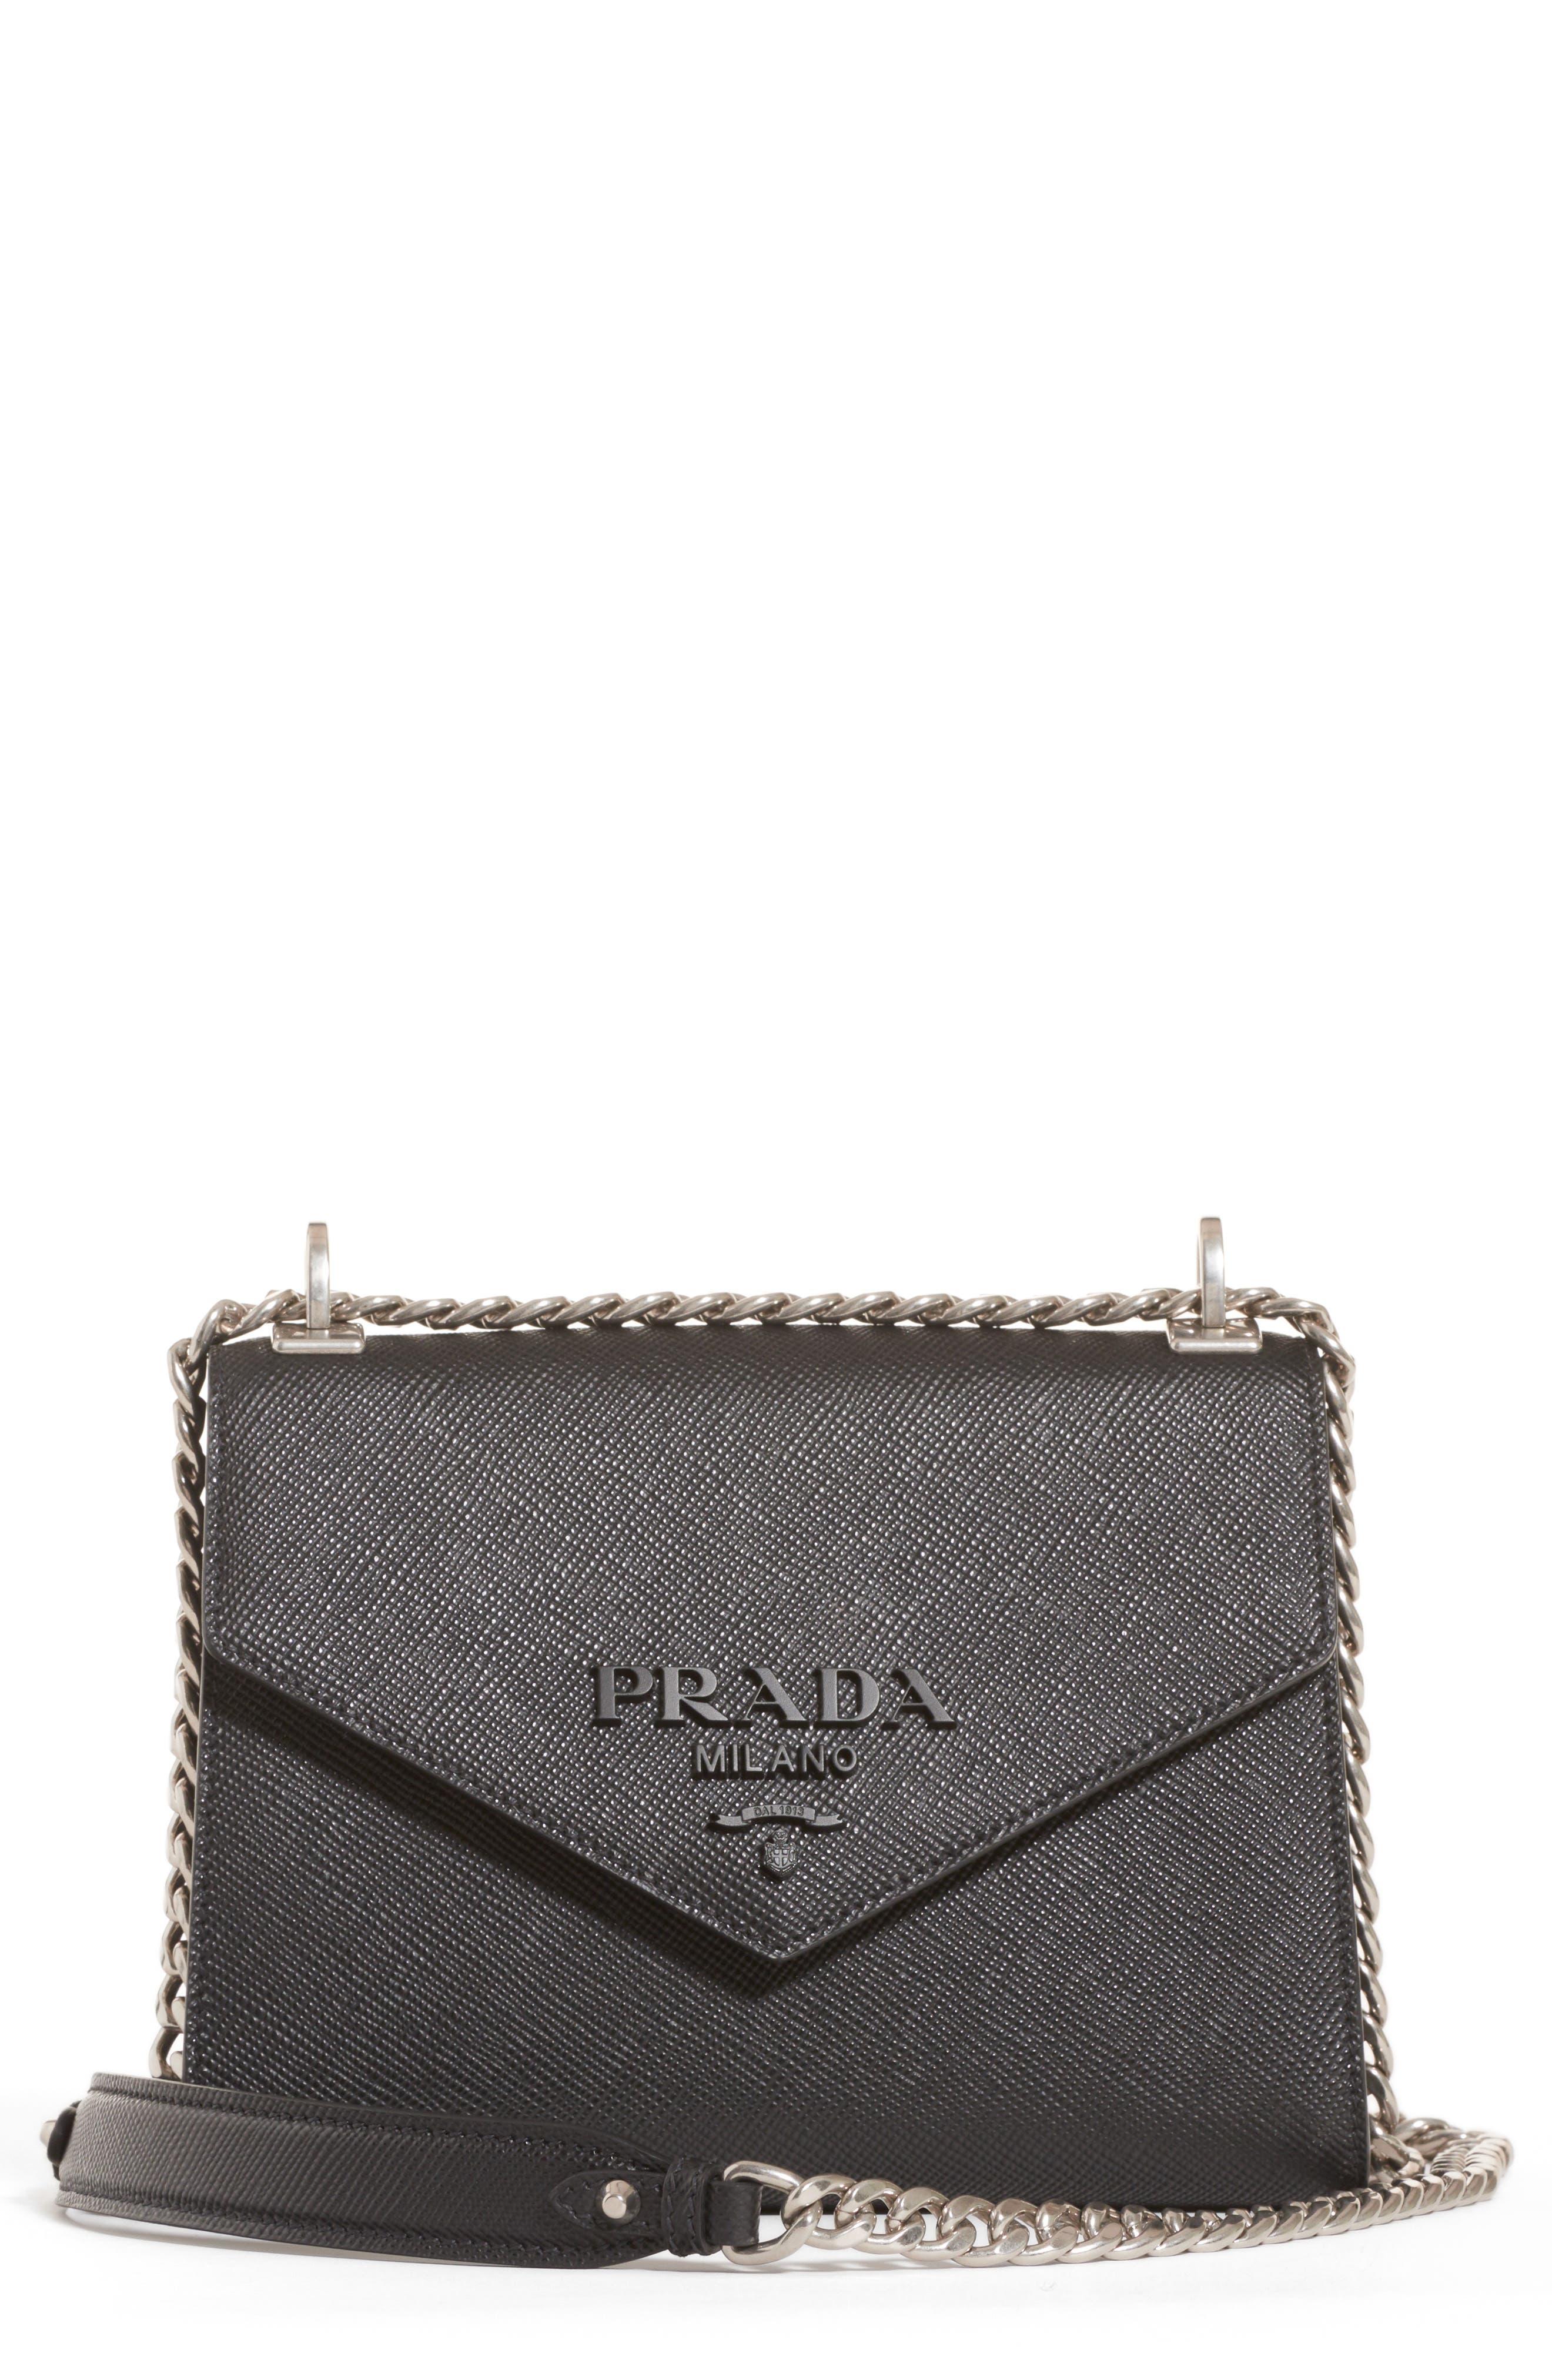 PRADA Monochrome Saffiano Leather Shoulder Bag, Main, color, NERO